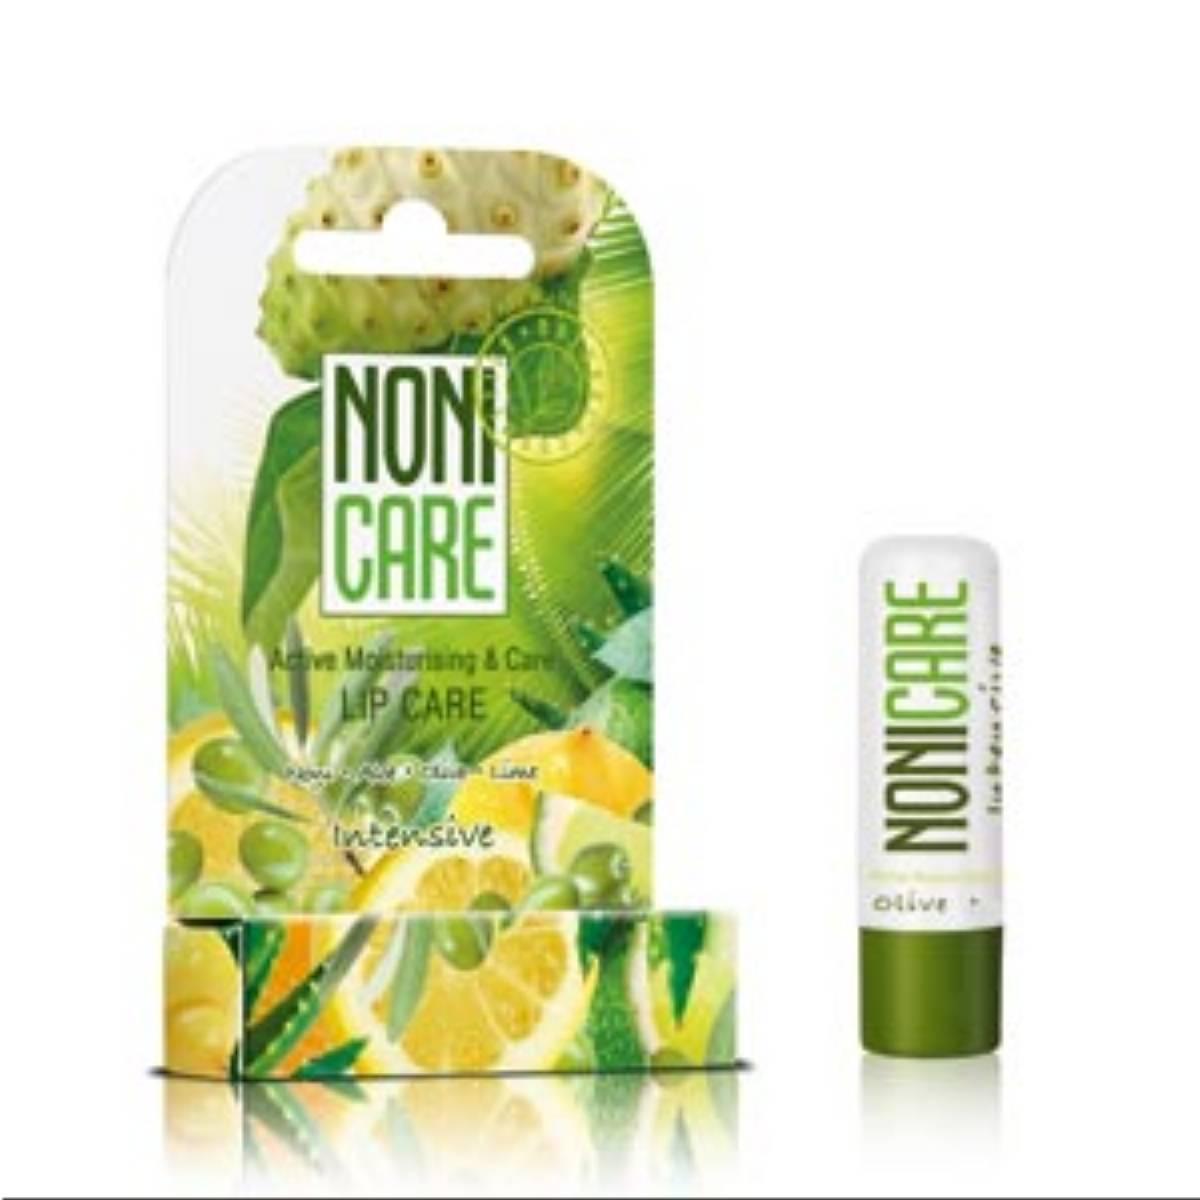 Pomadka ochronna Noni Care Intensive Active Moisturising & Care - Oliwki, Aloes i Limonka